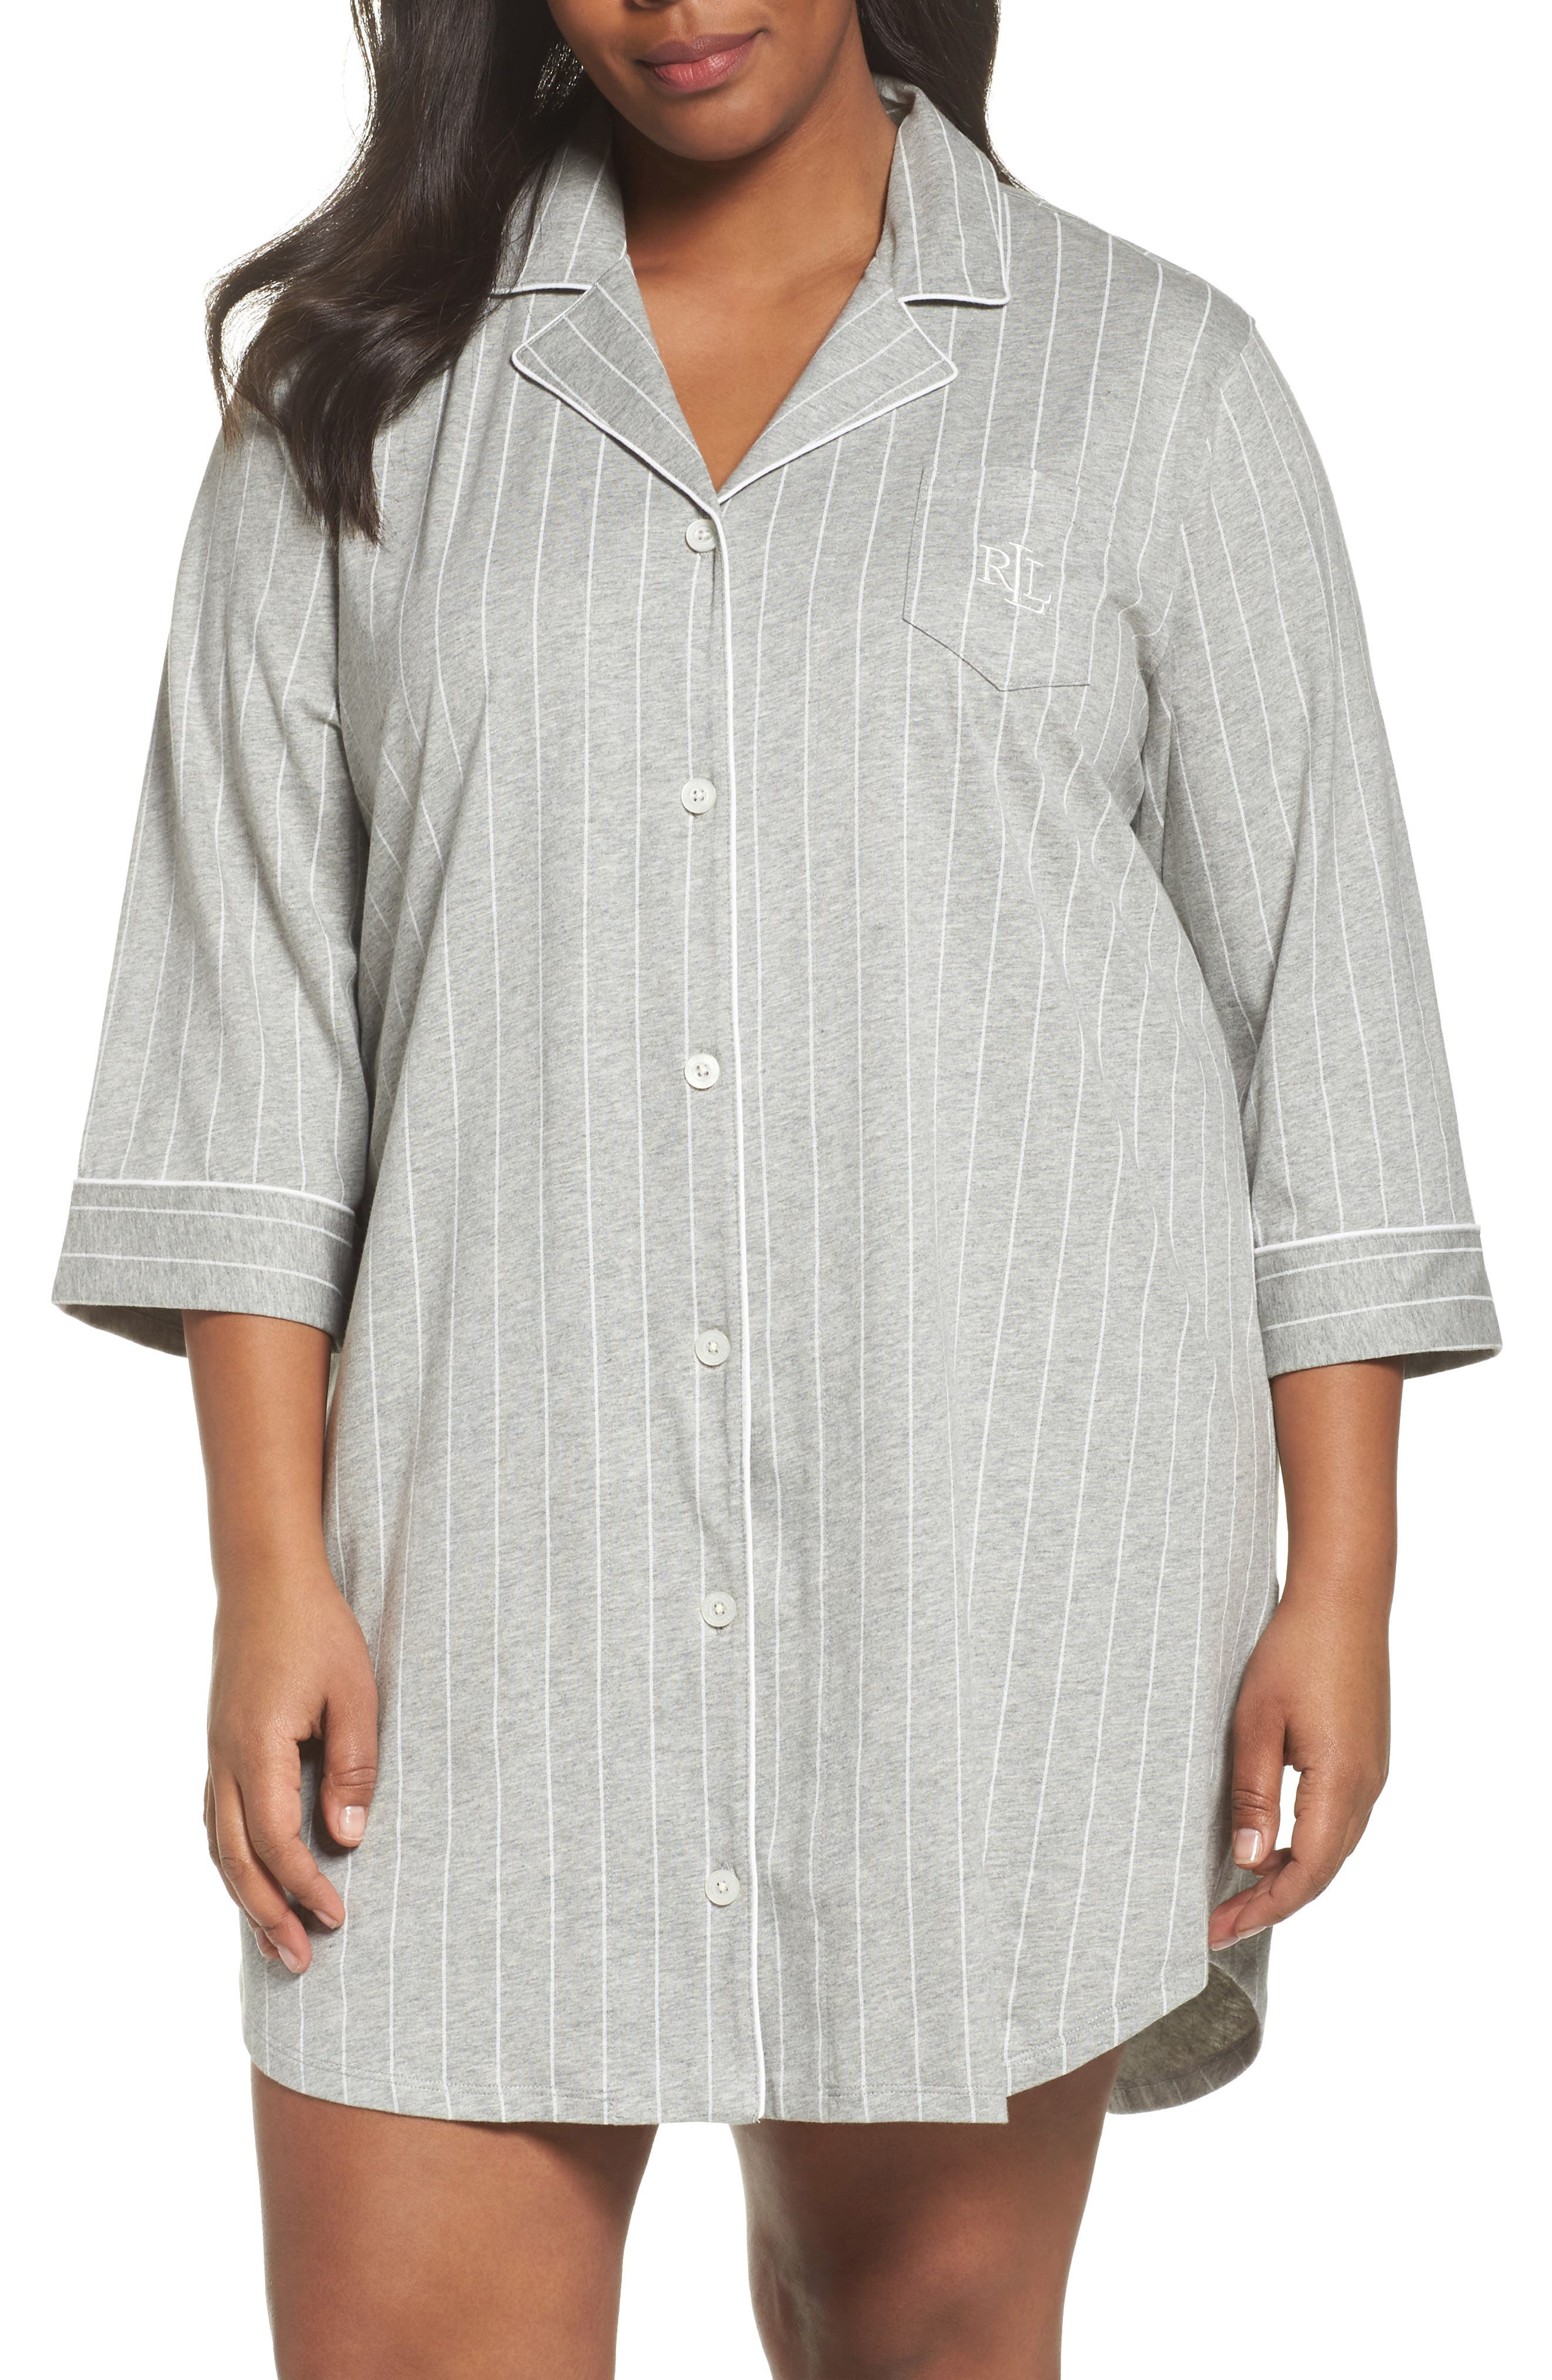 Knit Jersey Sleep Shirt,                             Main thumbnail 1, color,                             Greystone